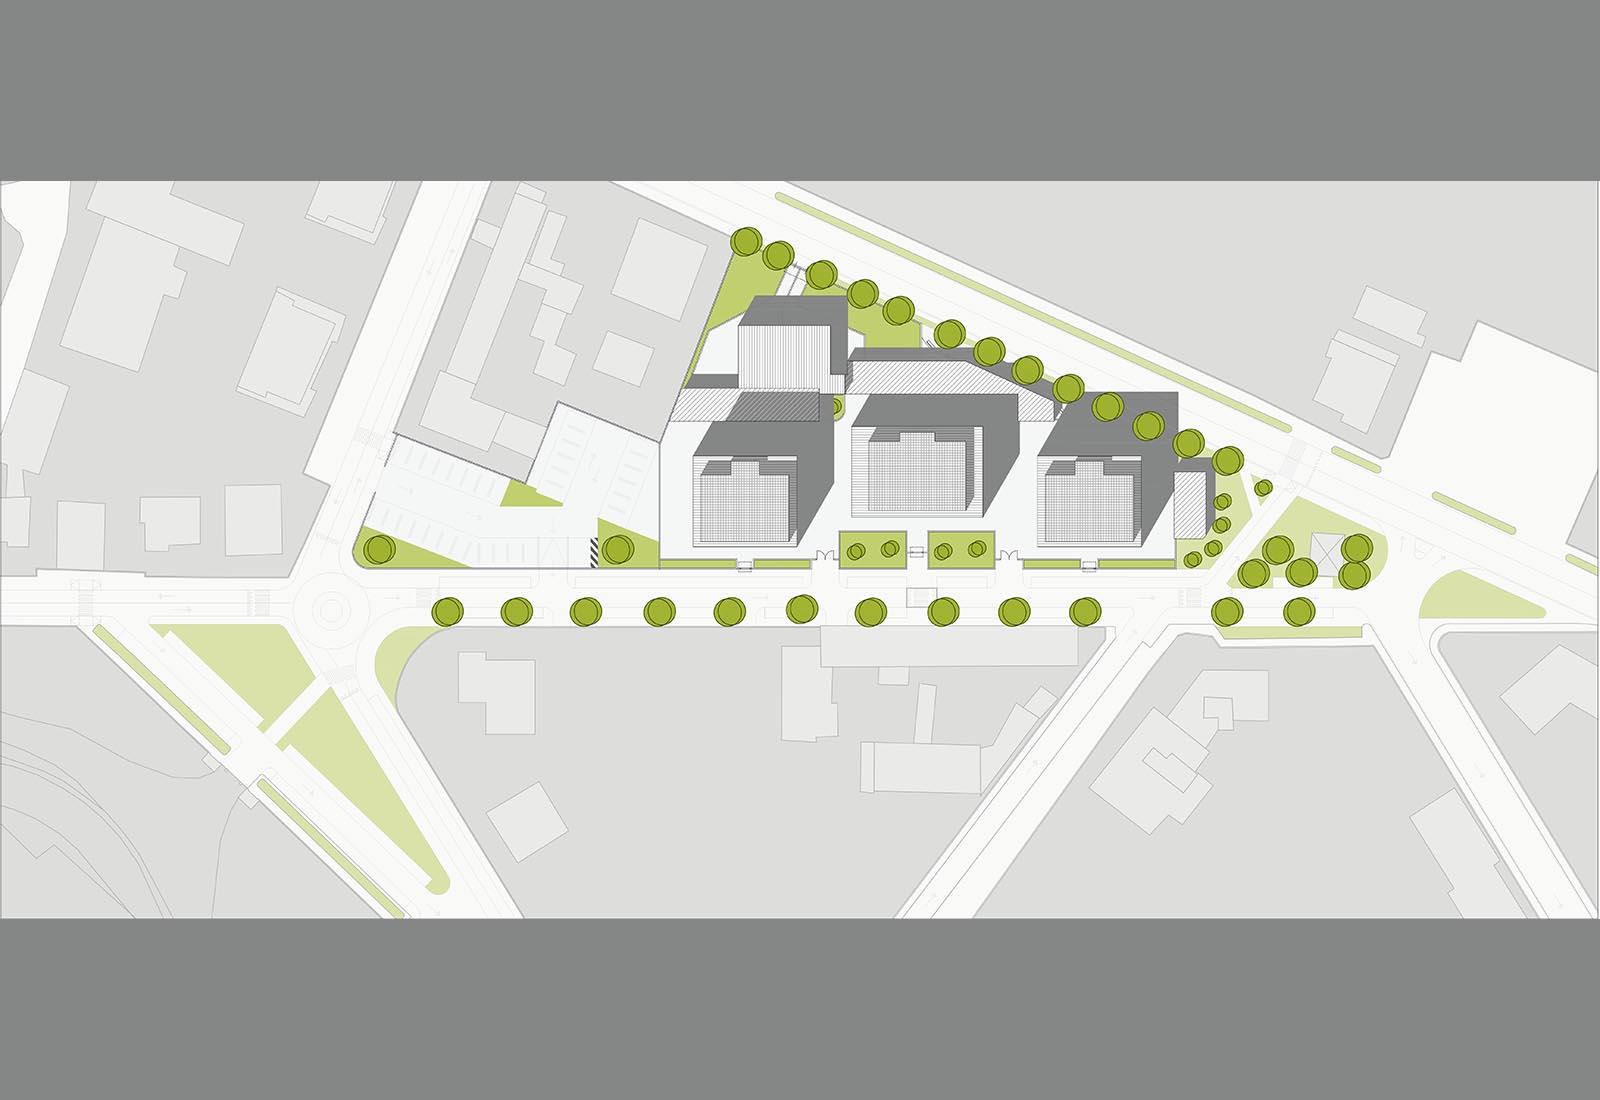 Residenze via Biringhello a Rho - Planivolumetrico schematico